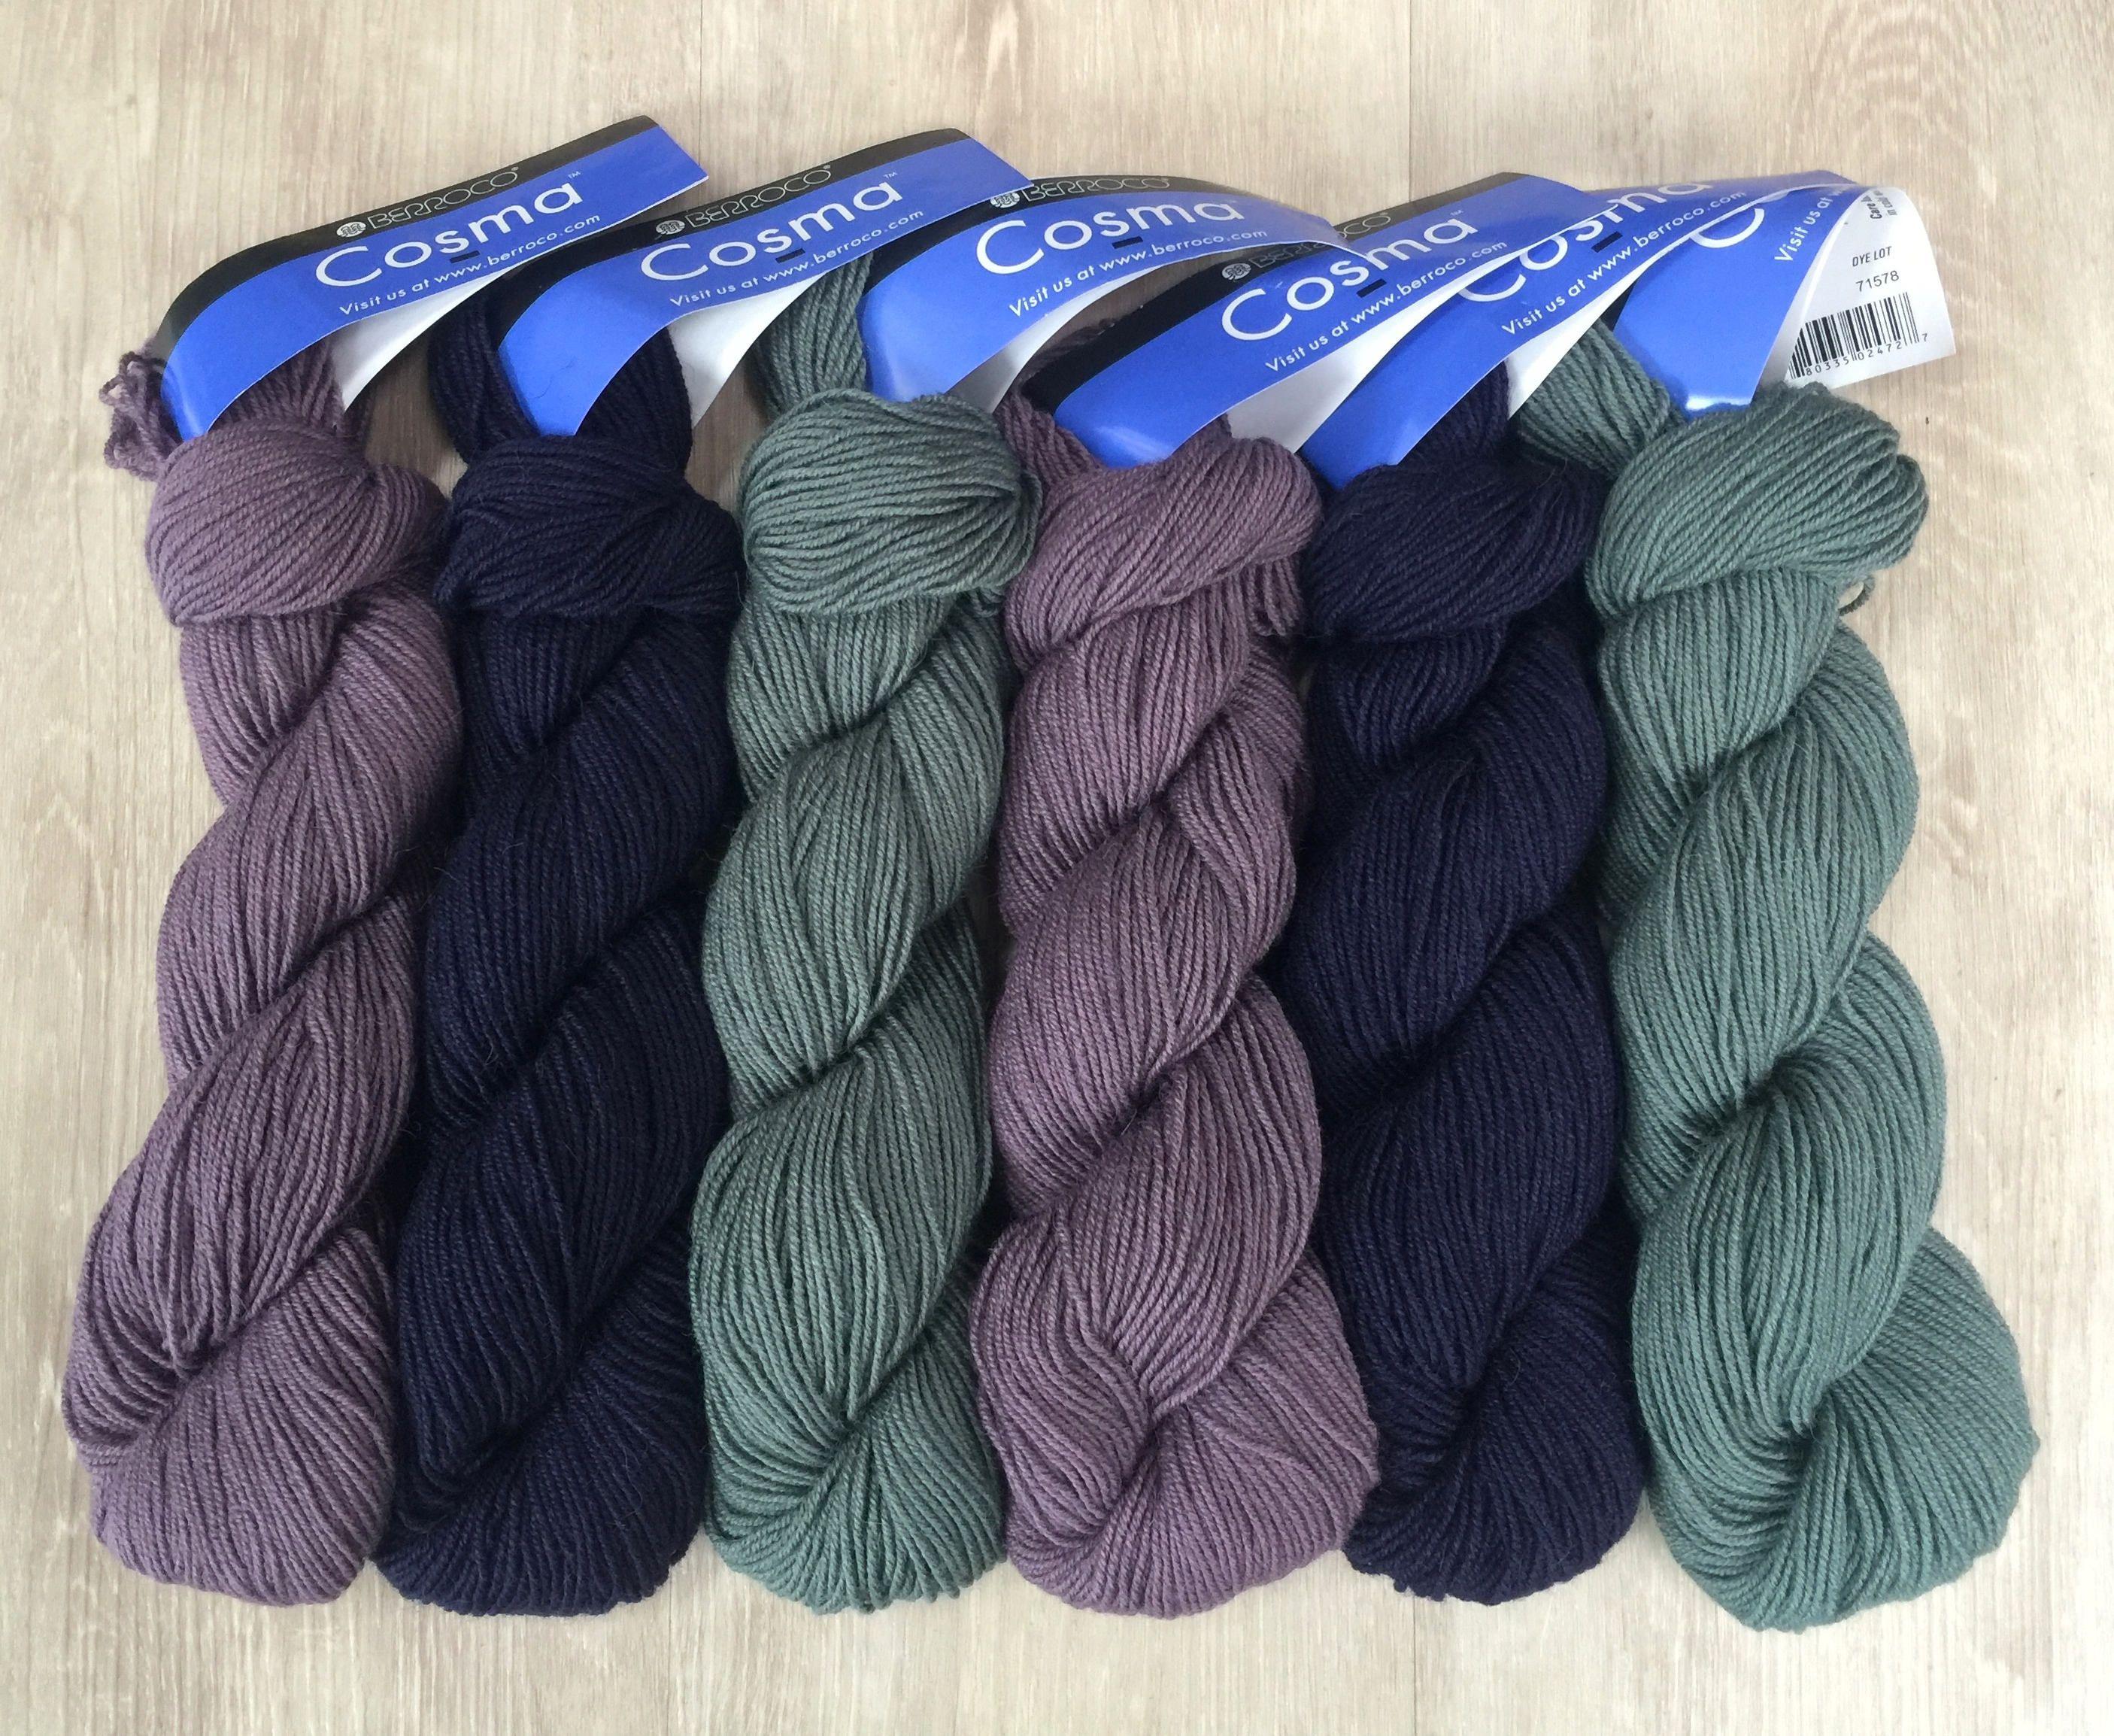 Berroco COSMA 10.50 +.75ea Ship Alpaca Wool Silk Sport Yarn Willow ...